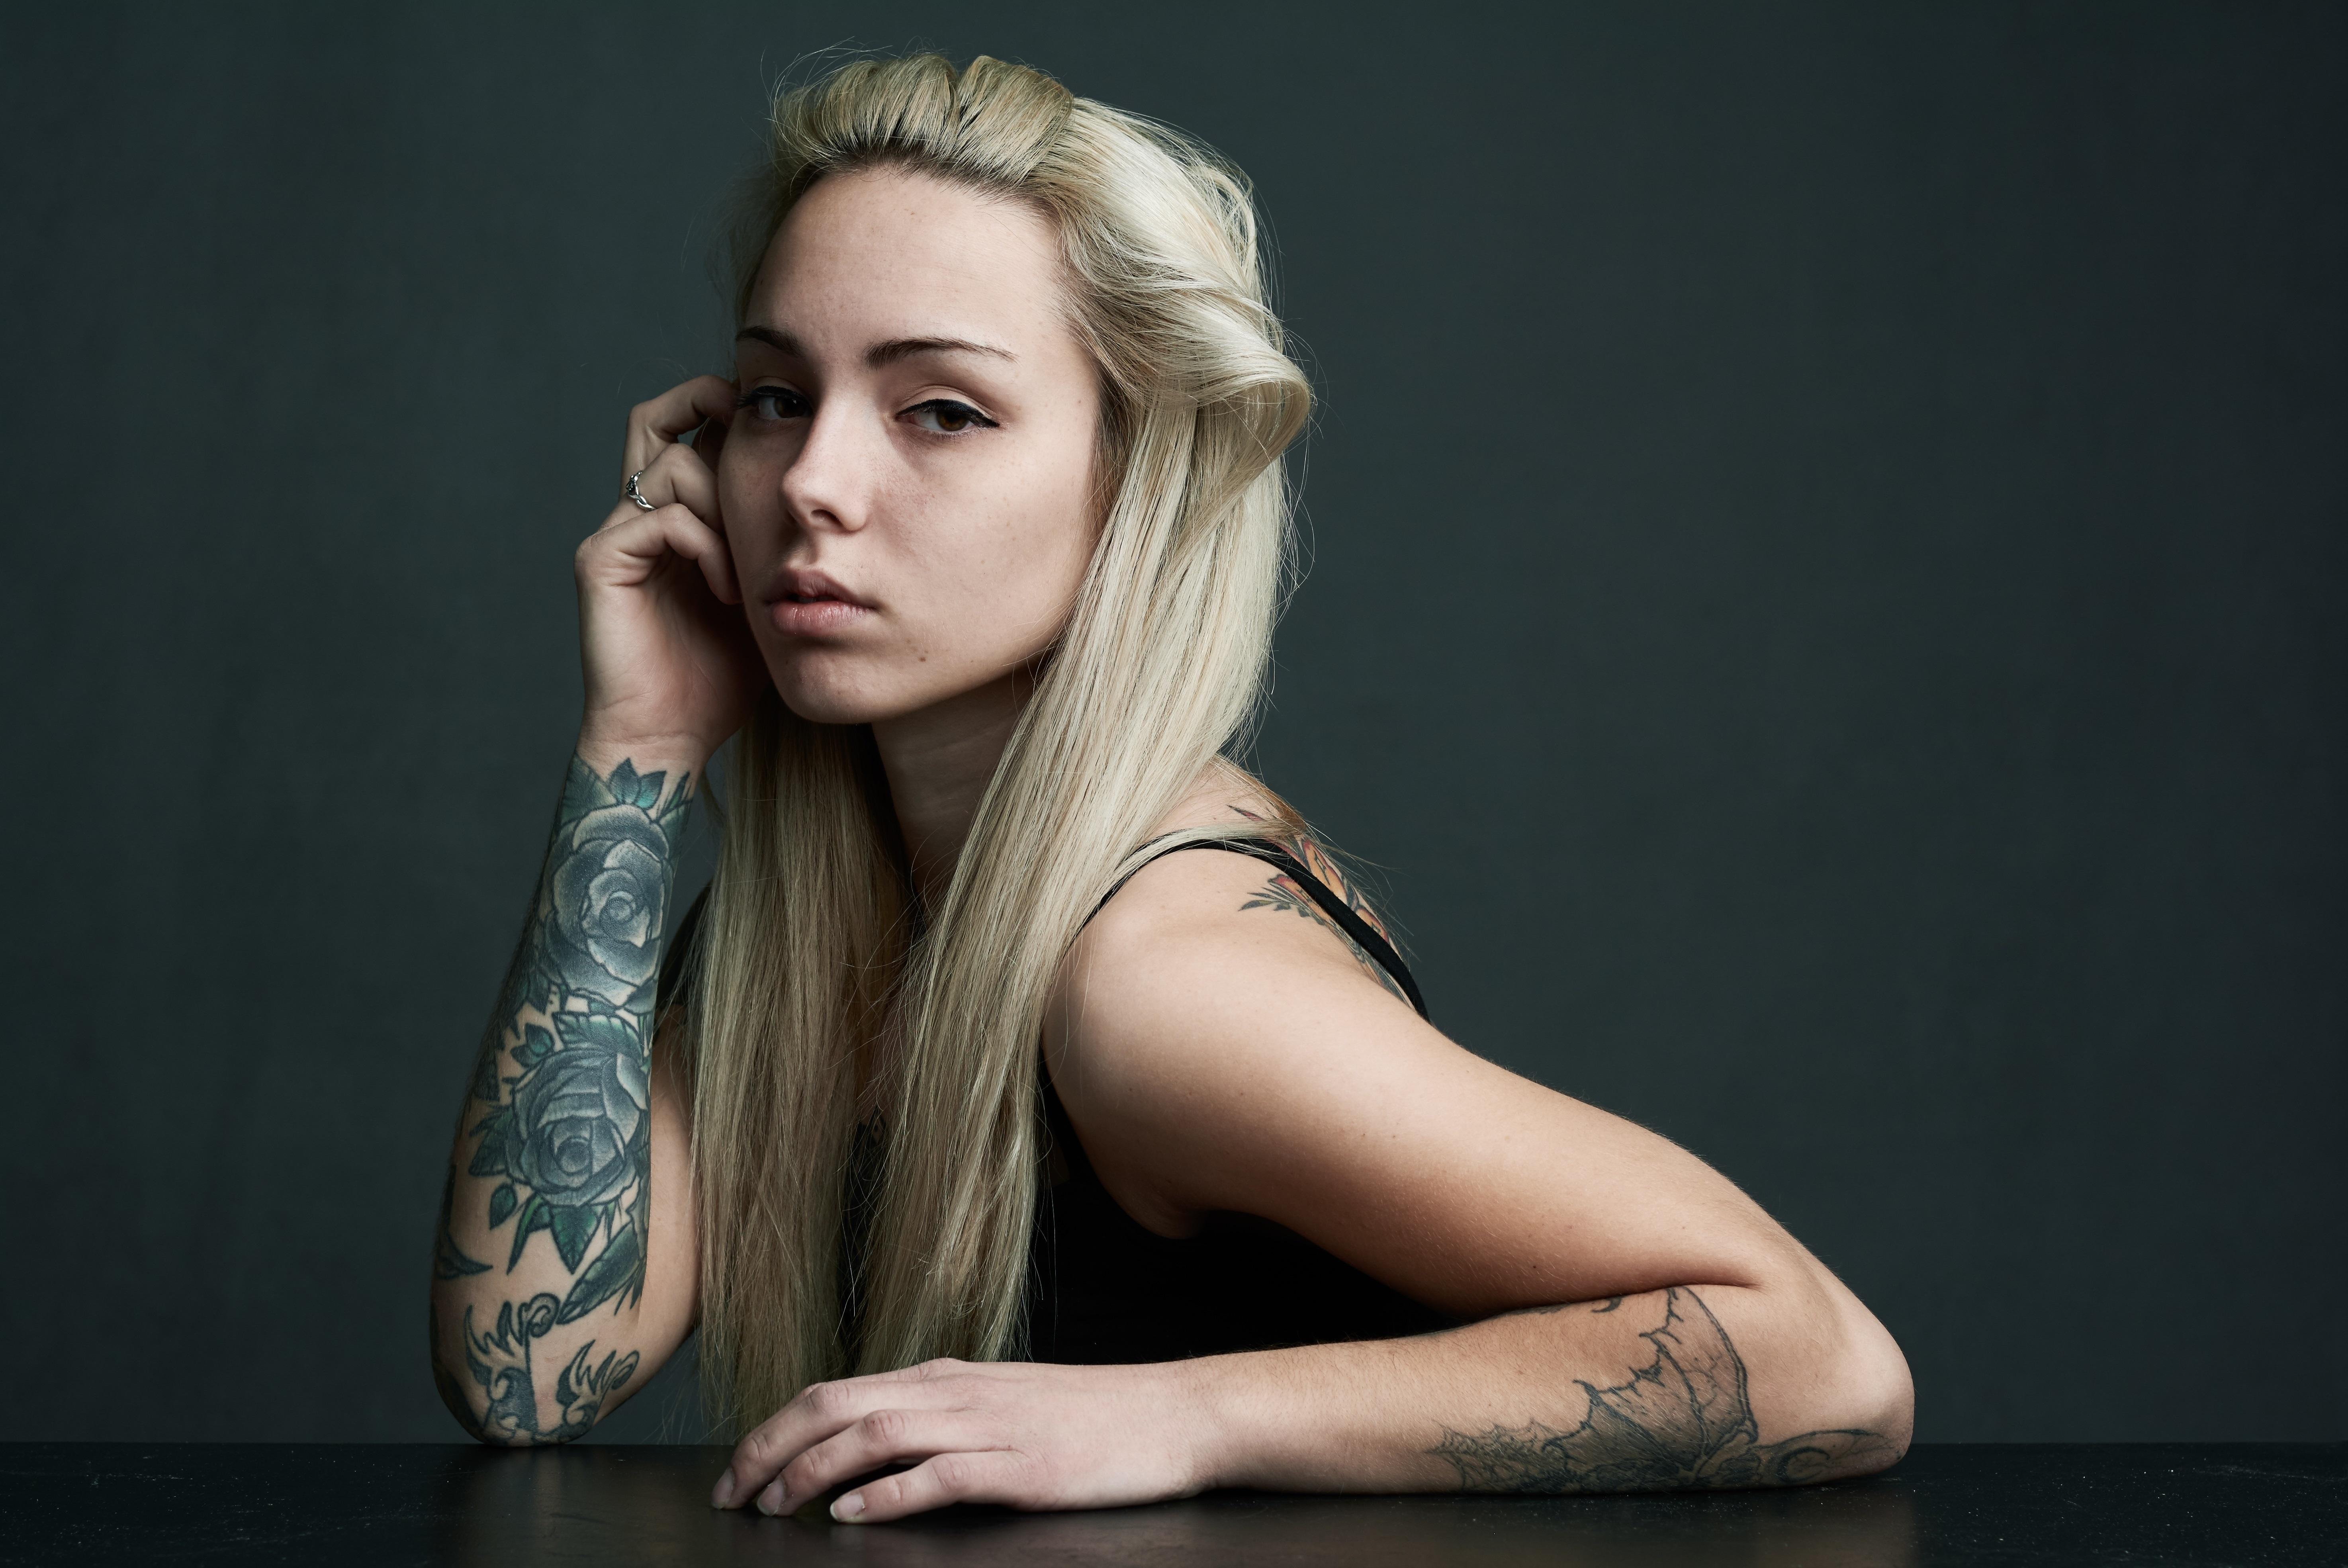 Картинки стихи, картинки с татуировками девушки